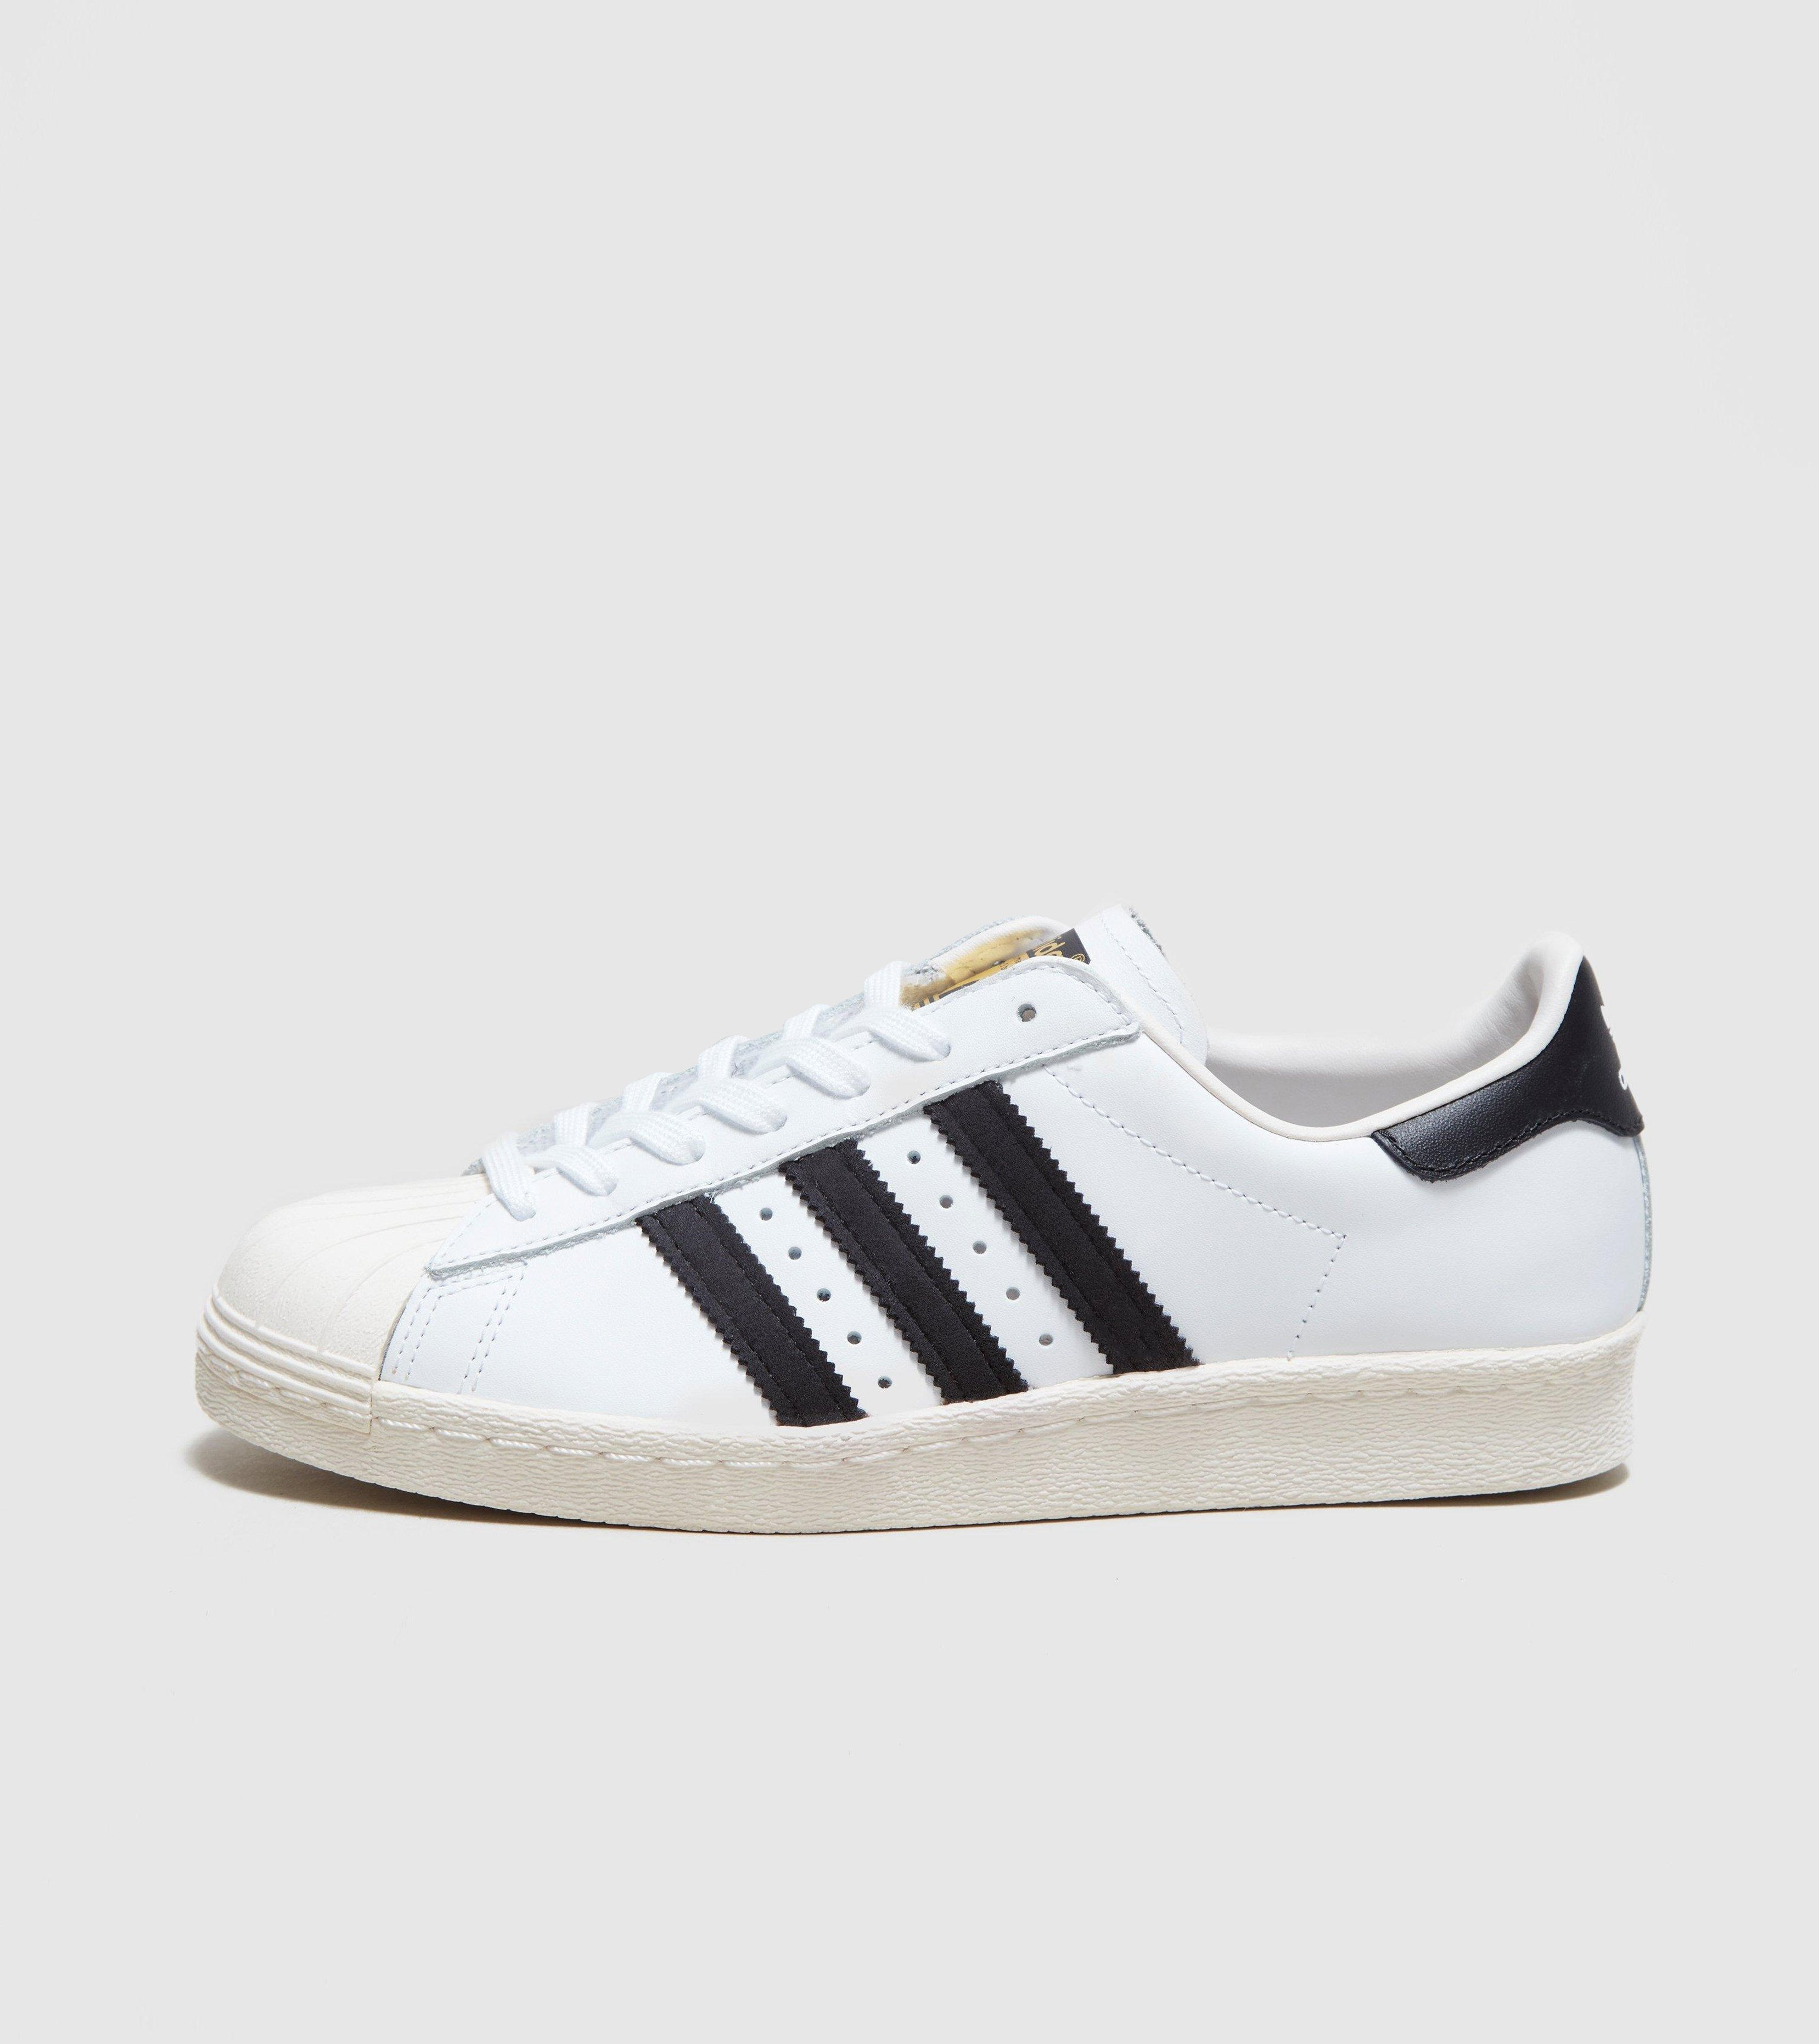 adidas Originals Superstar 80s   Size?